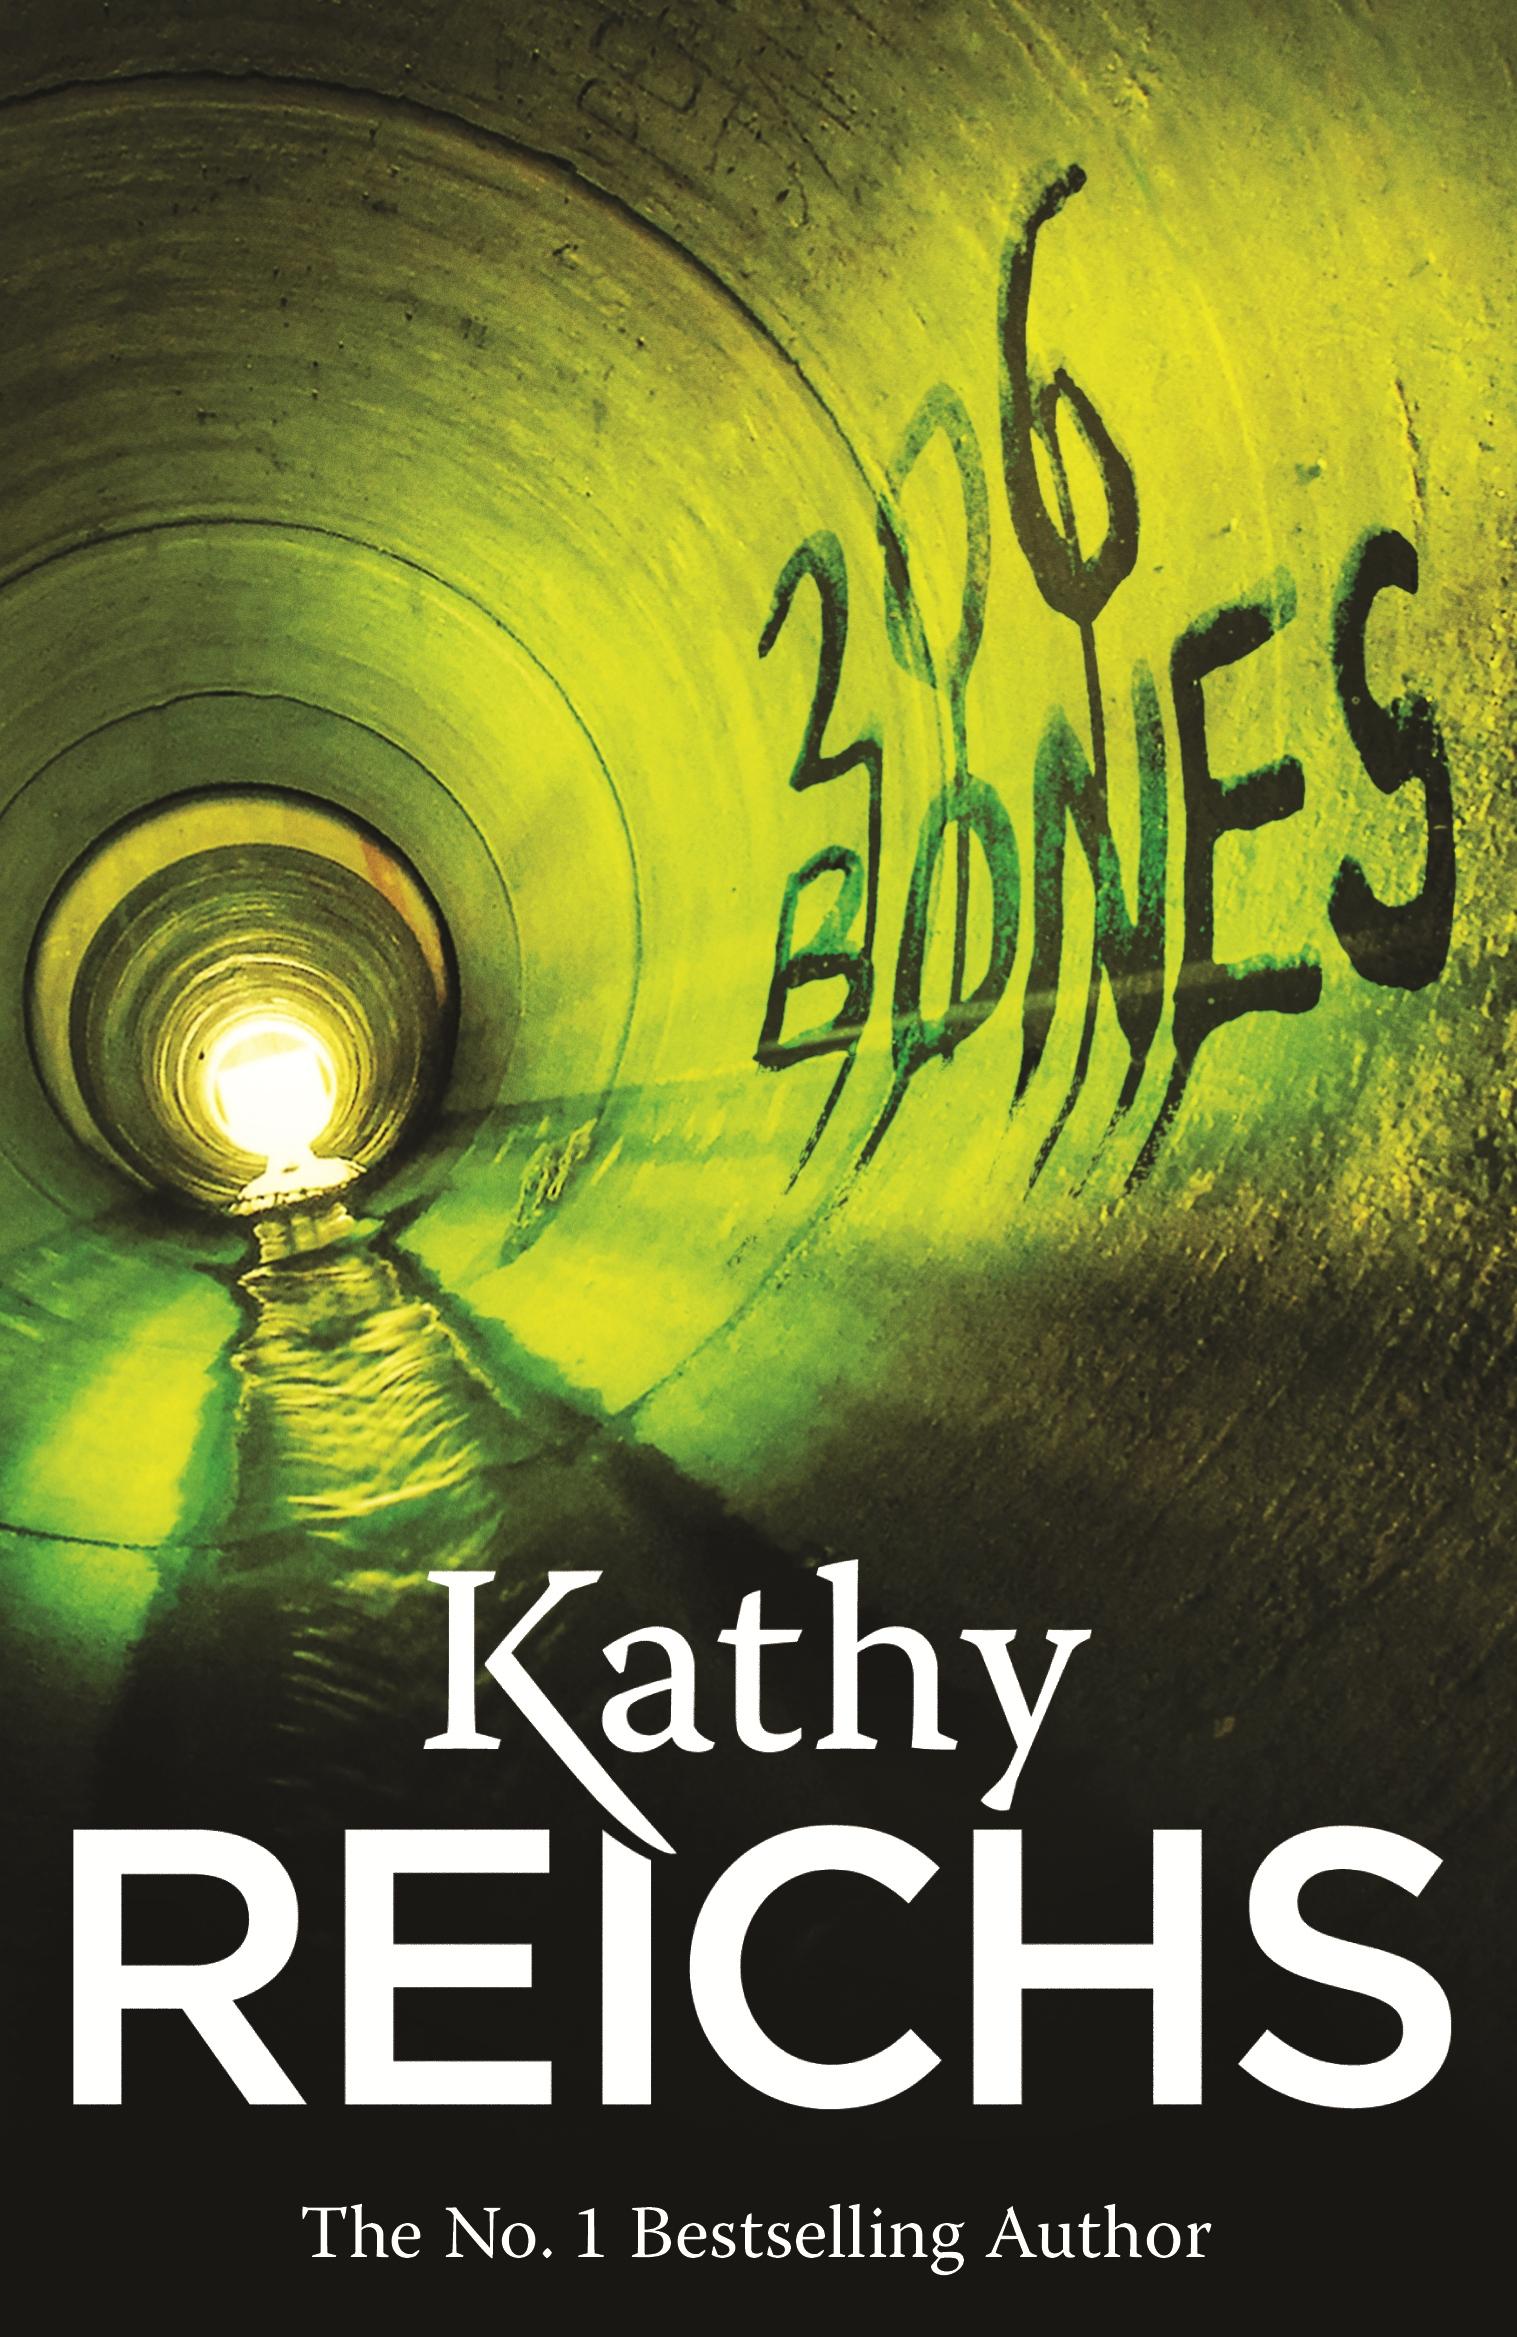 206 Bones by Kathy Reichs - Penguin Books Australia